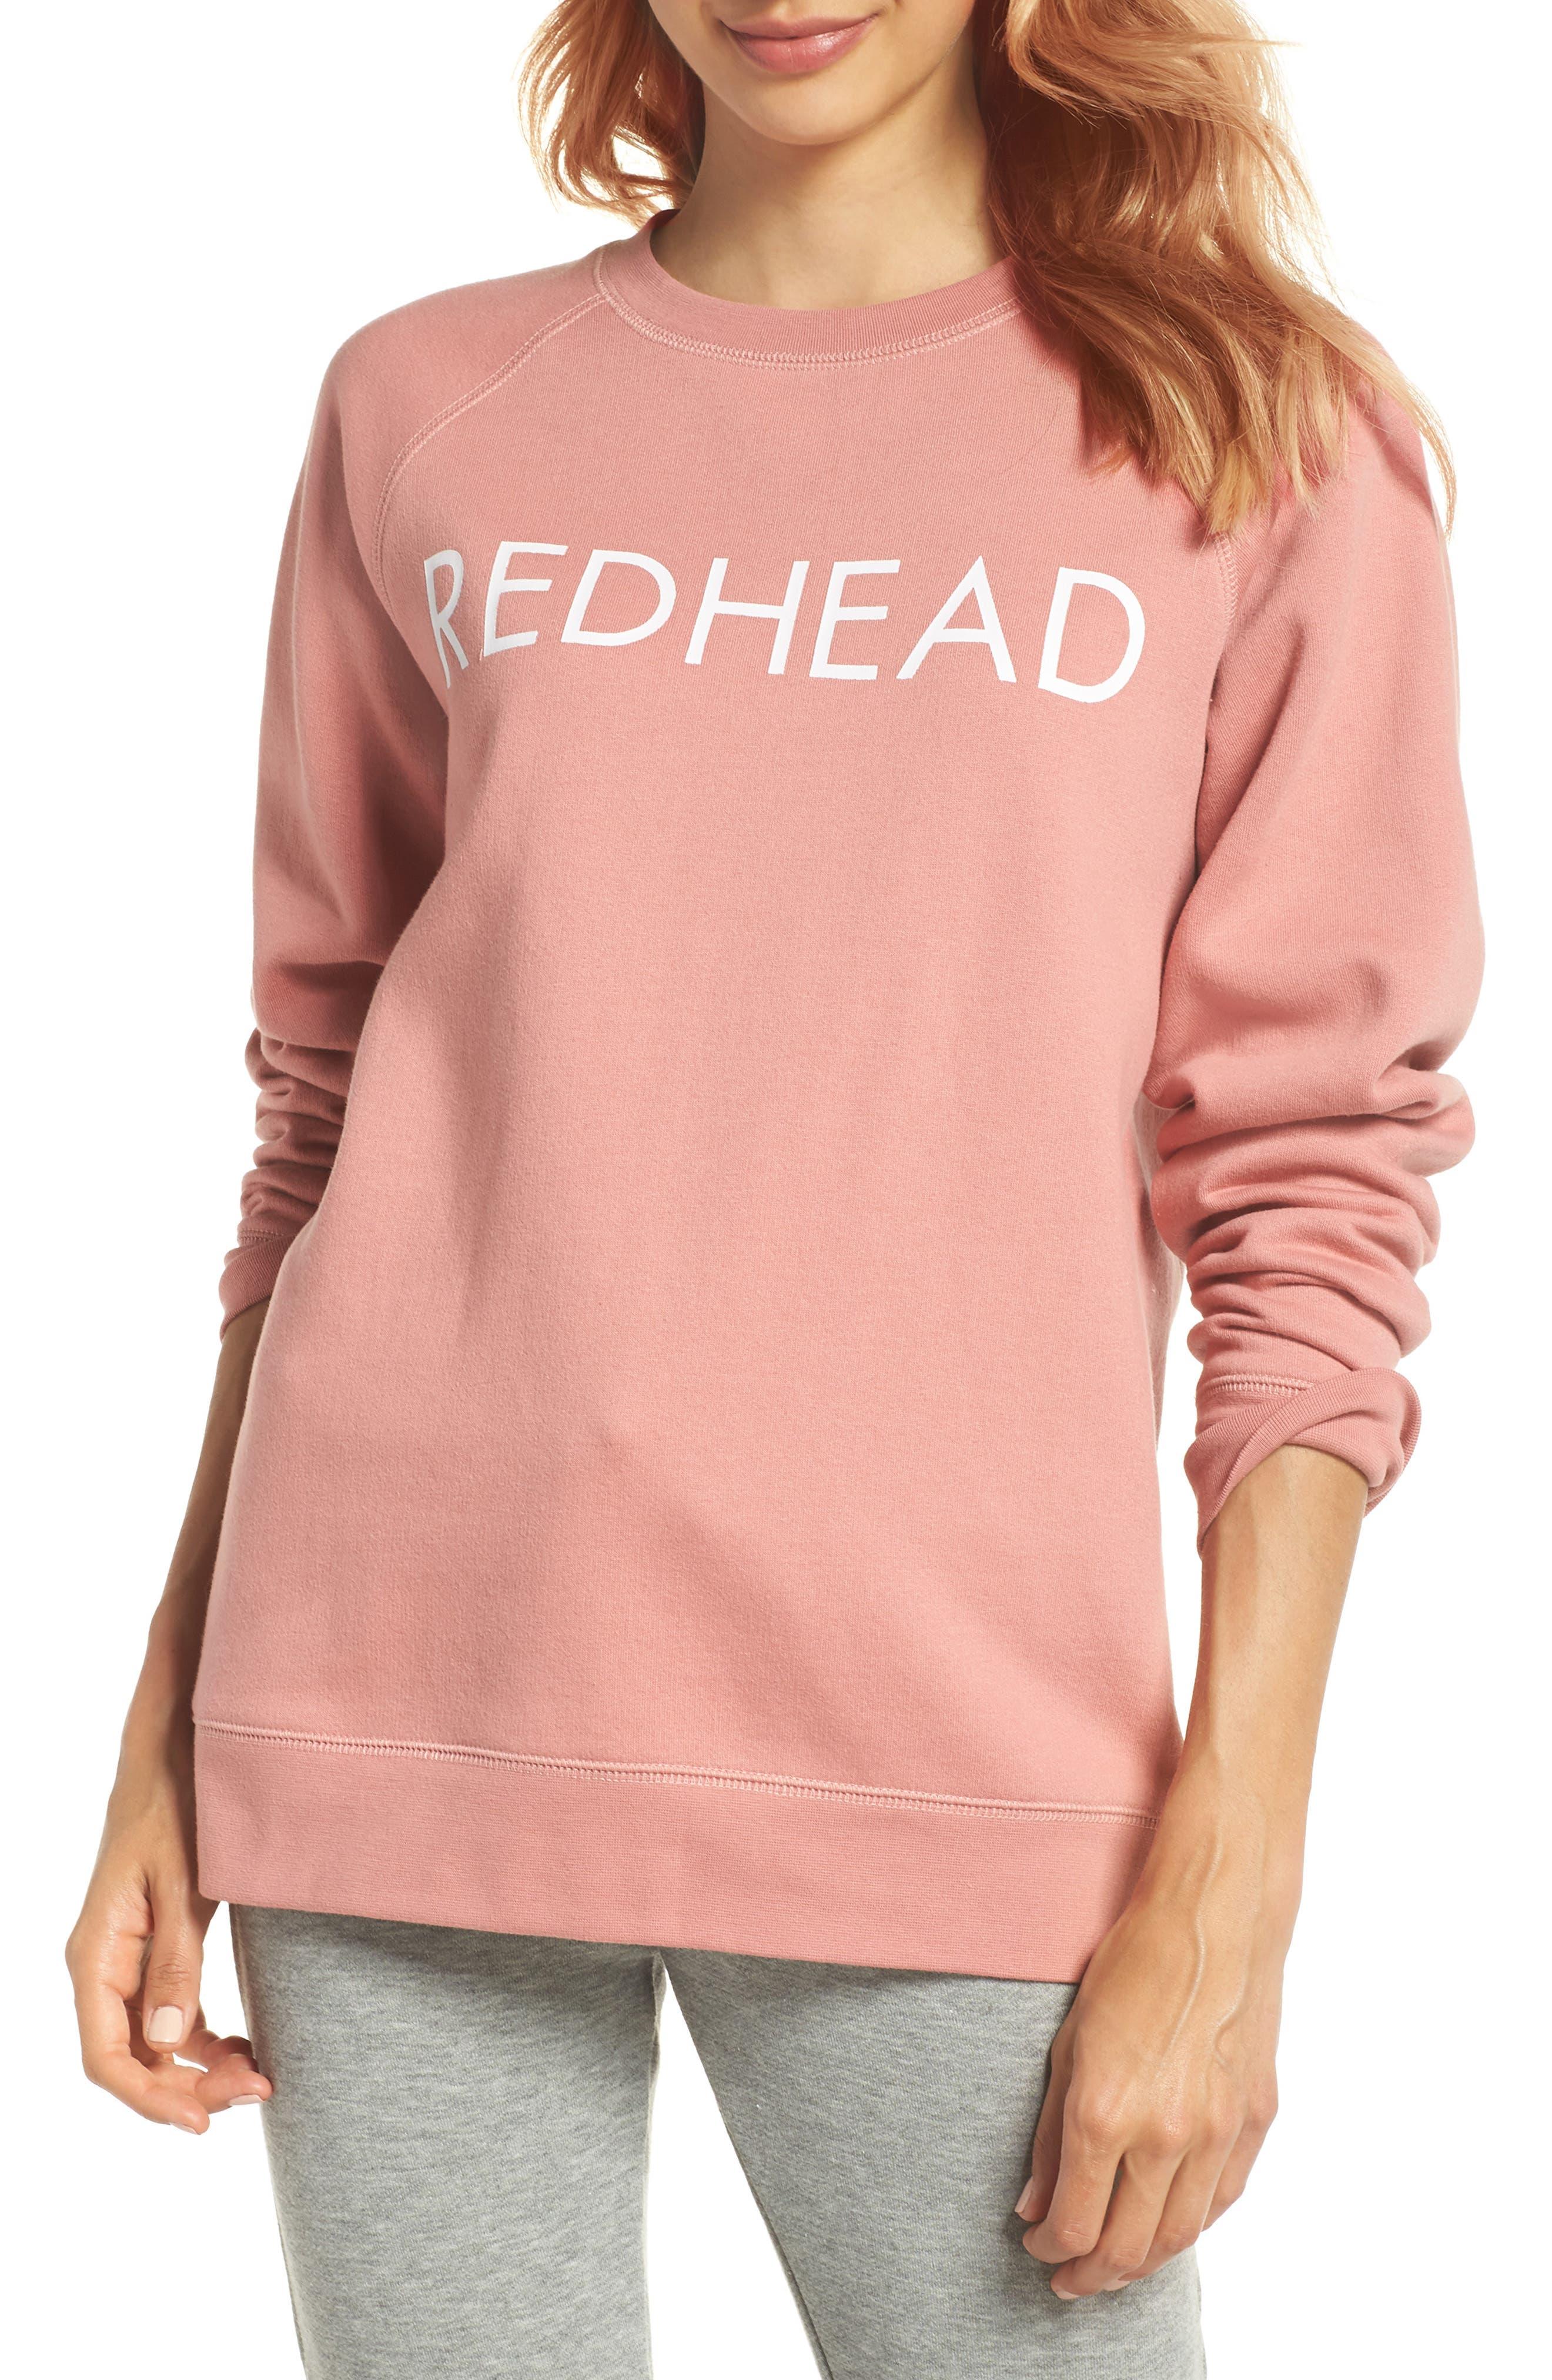 Redhead Crewneck Sweatshirt,                         Main,                         color, Dusty Rose